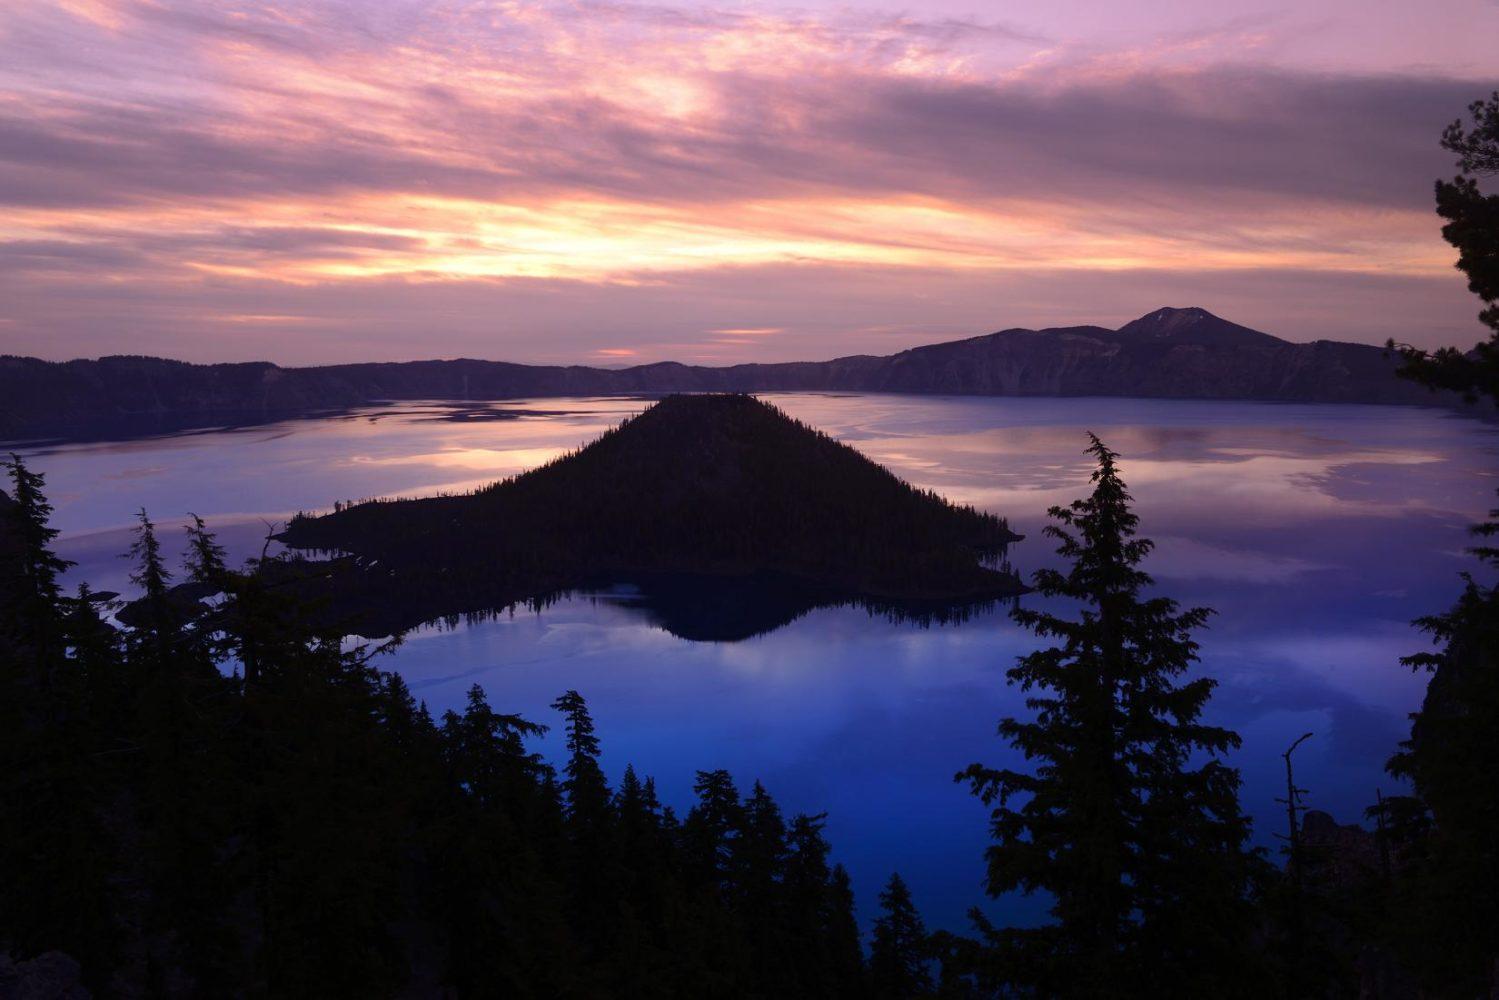 Wizard Island, Crater Lake National Park, Oregon, USA